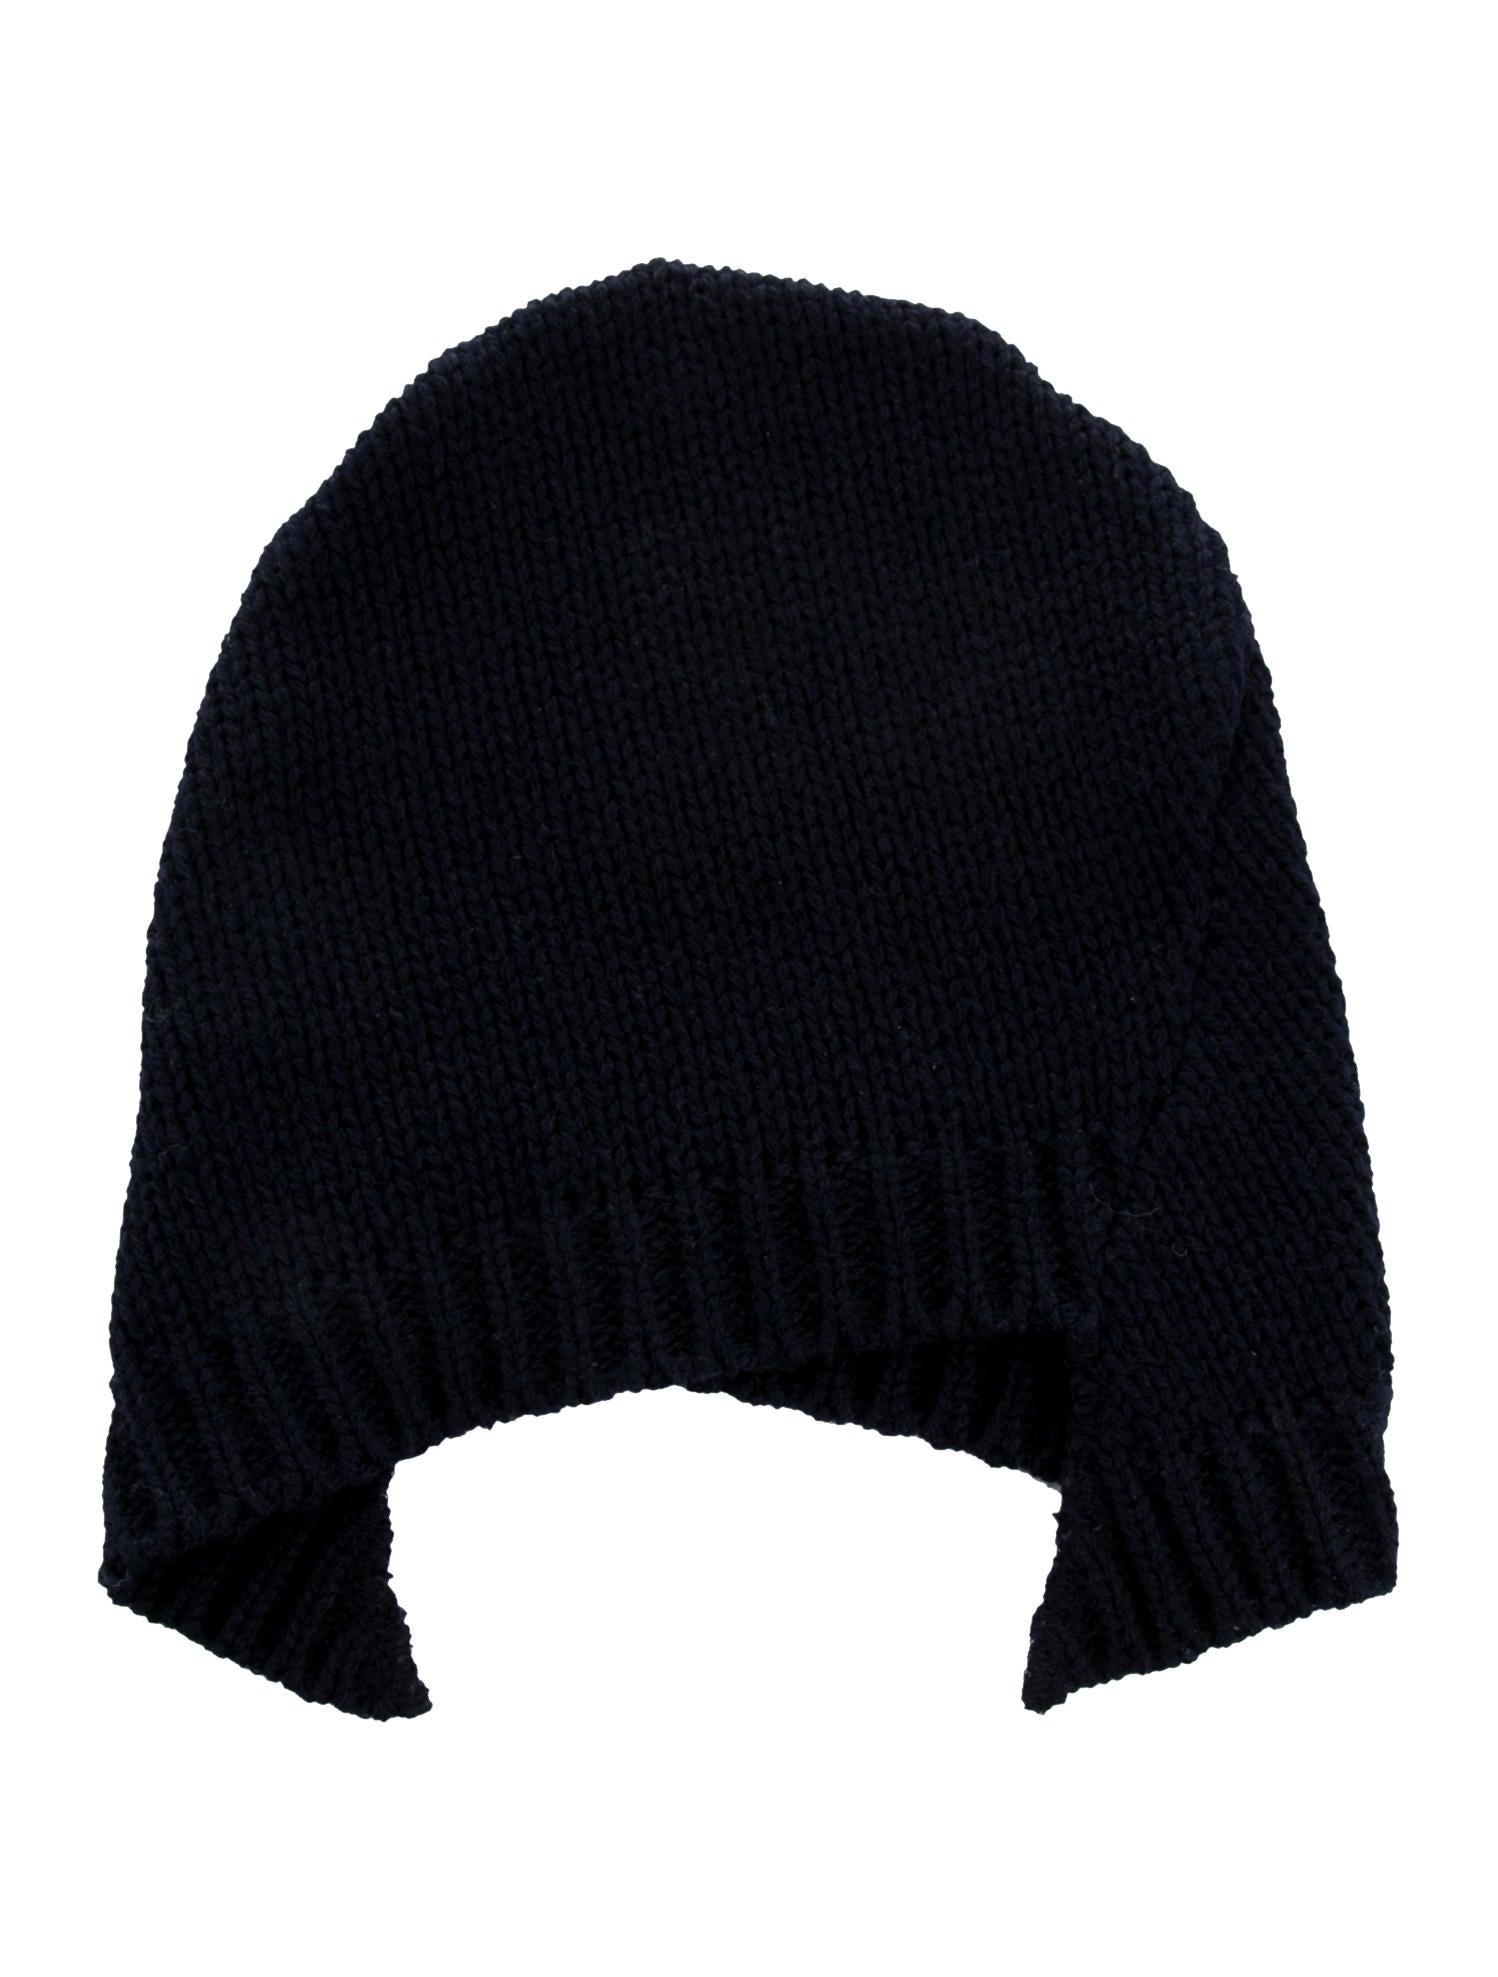 Comme des Garçons Wool Asymmetrical Beanie - Accessories - COM24667 ... 7e6db9f1d1e